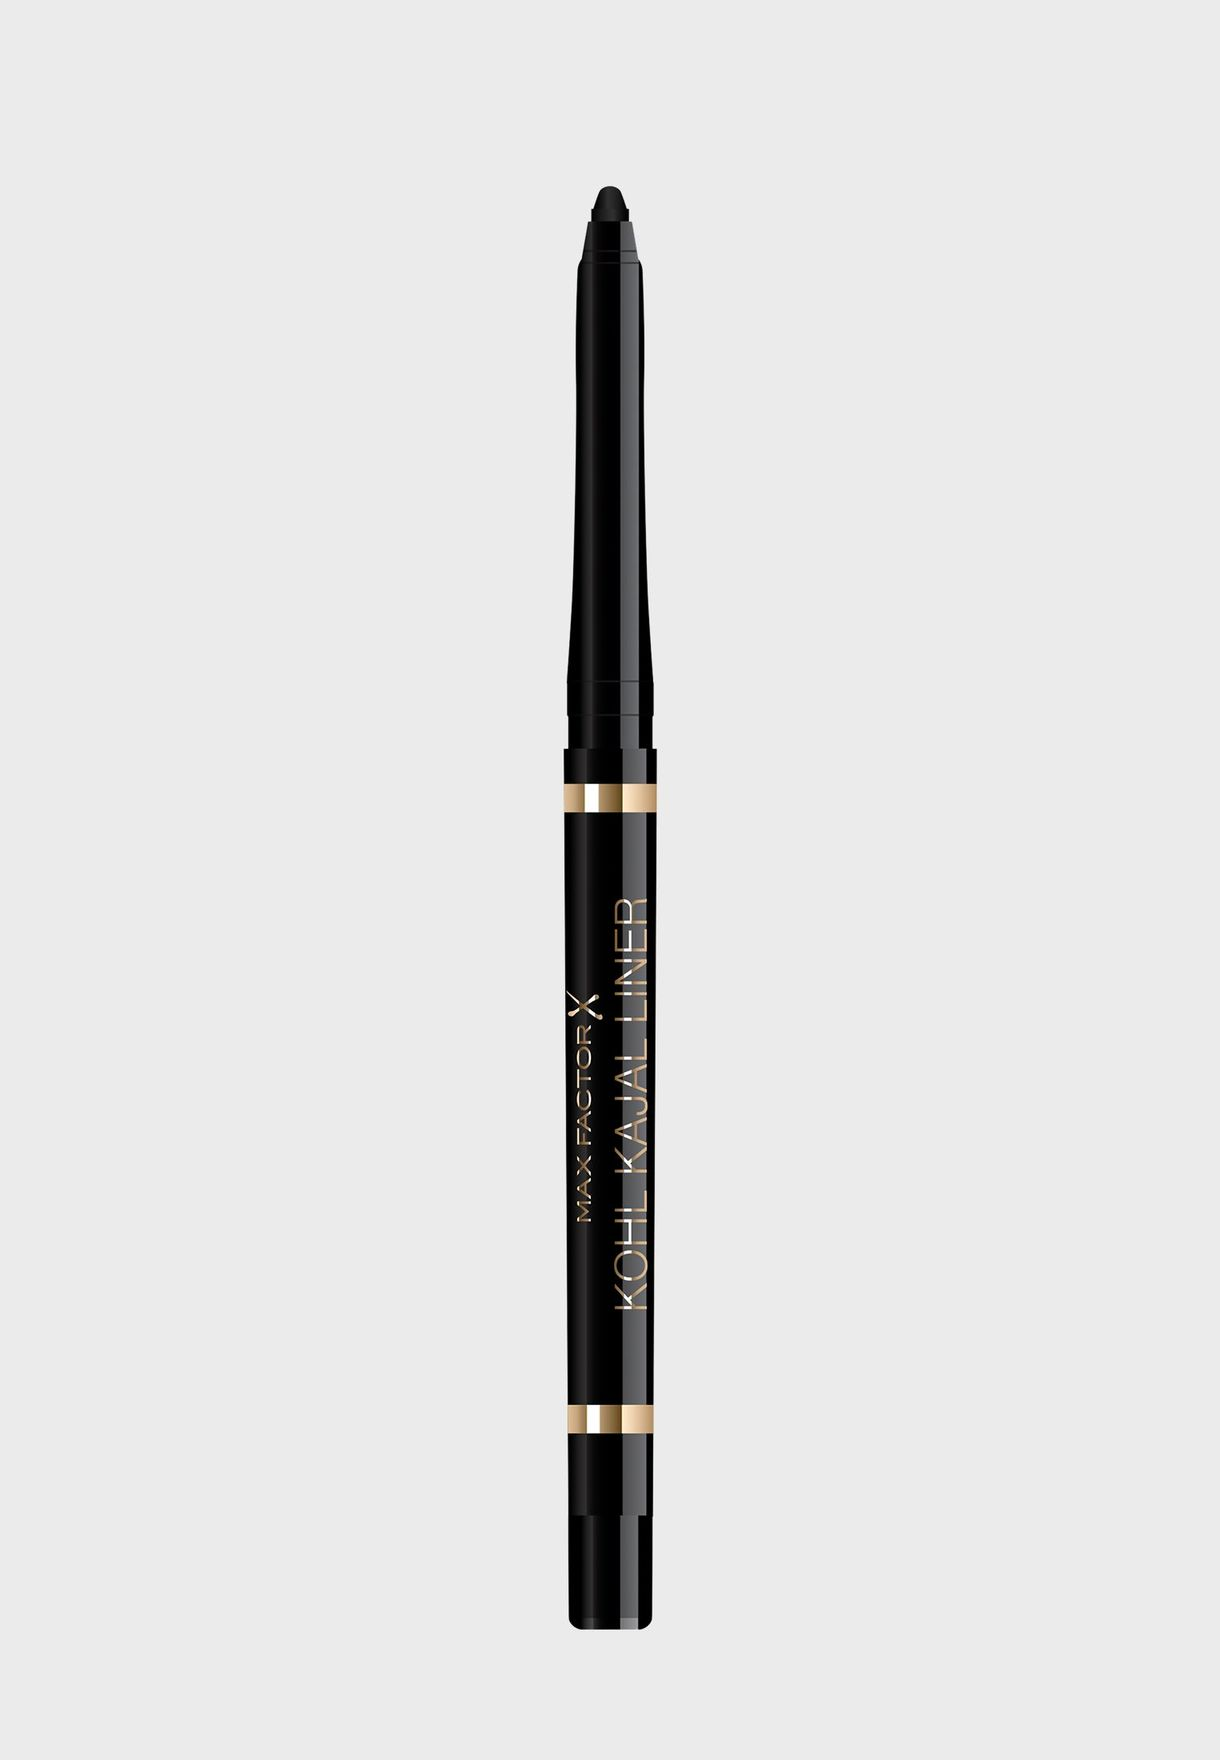 Masterpiece Kohl Kajal Pencil